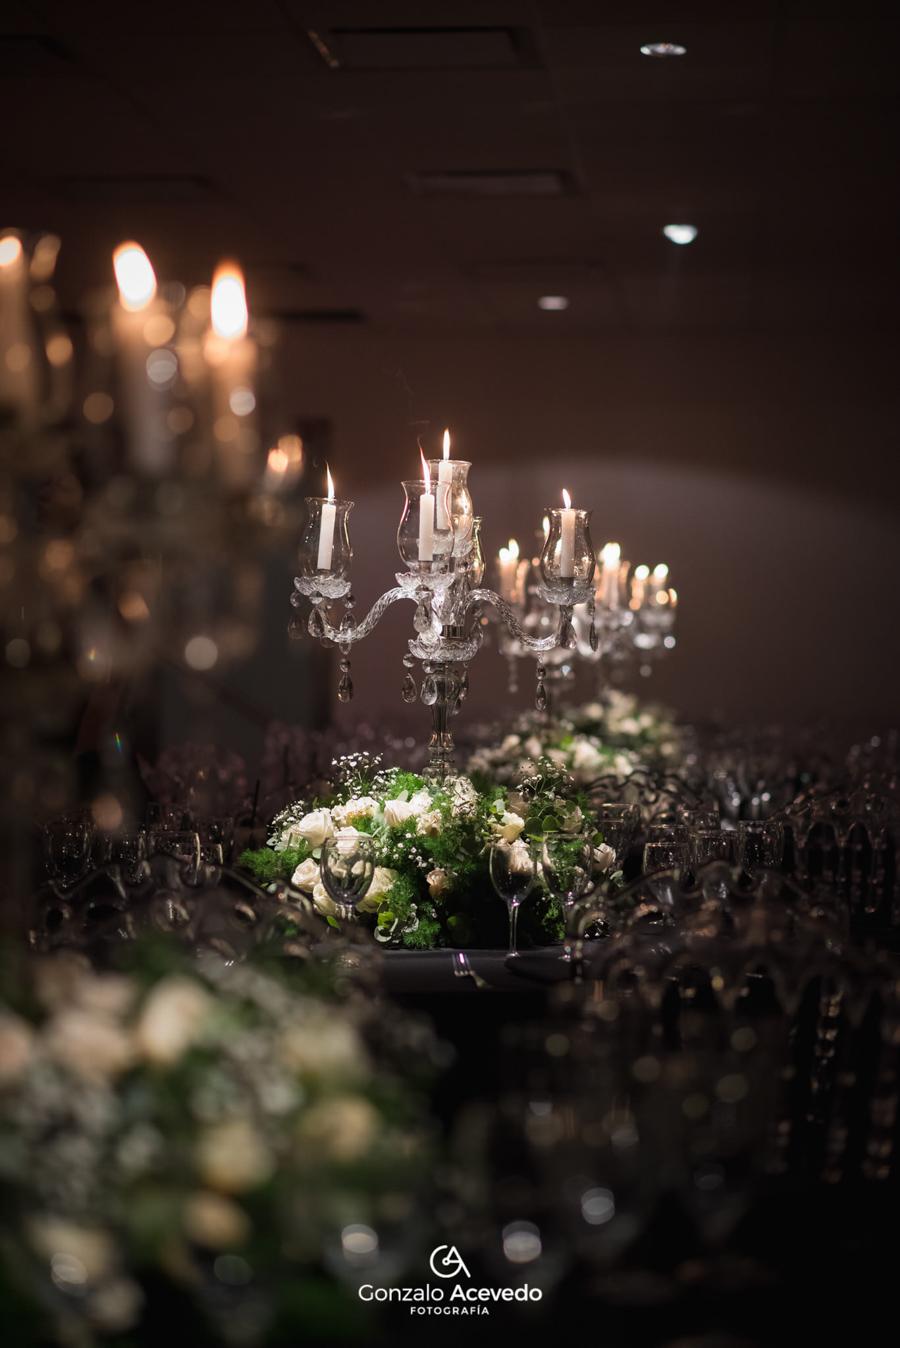 fiesta evento decoracion nancy cergneux #gonzaloacevedofotografia